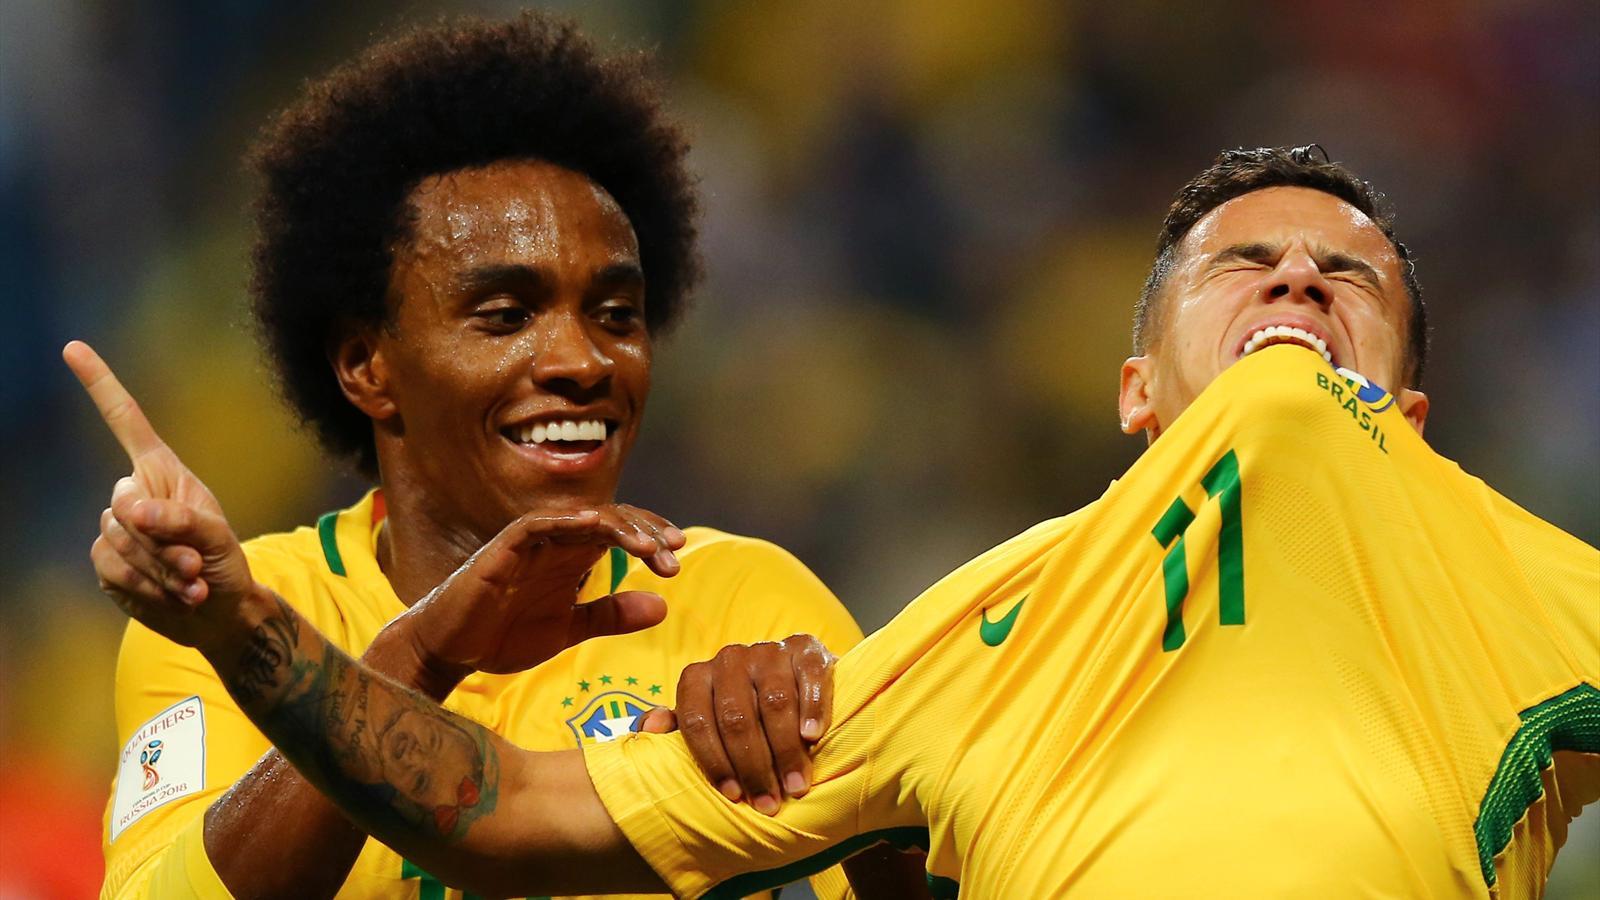 адриану знаком с бразильским наркобароном